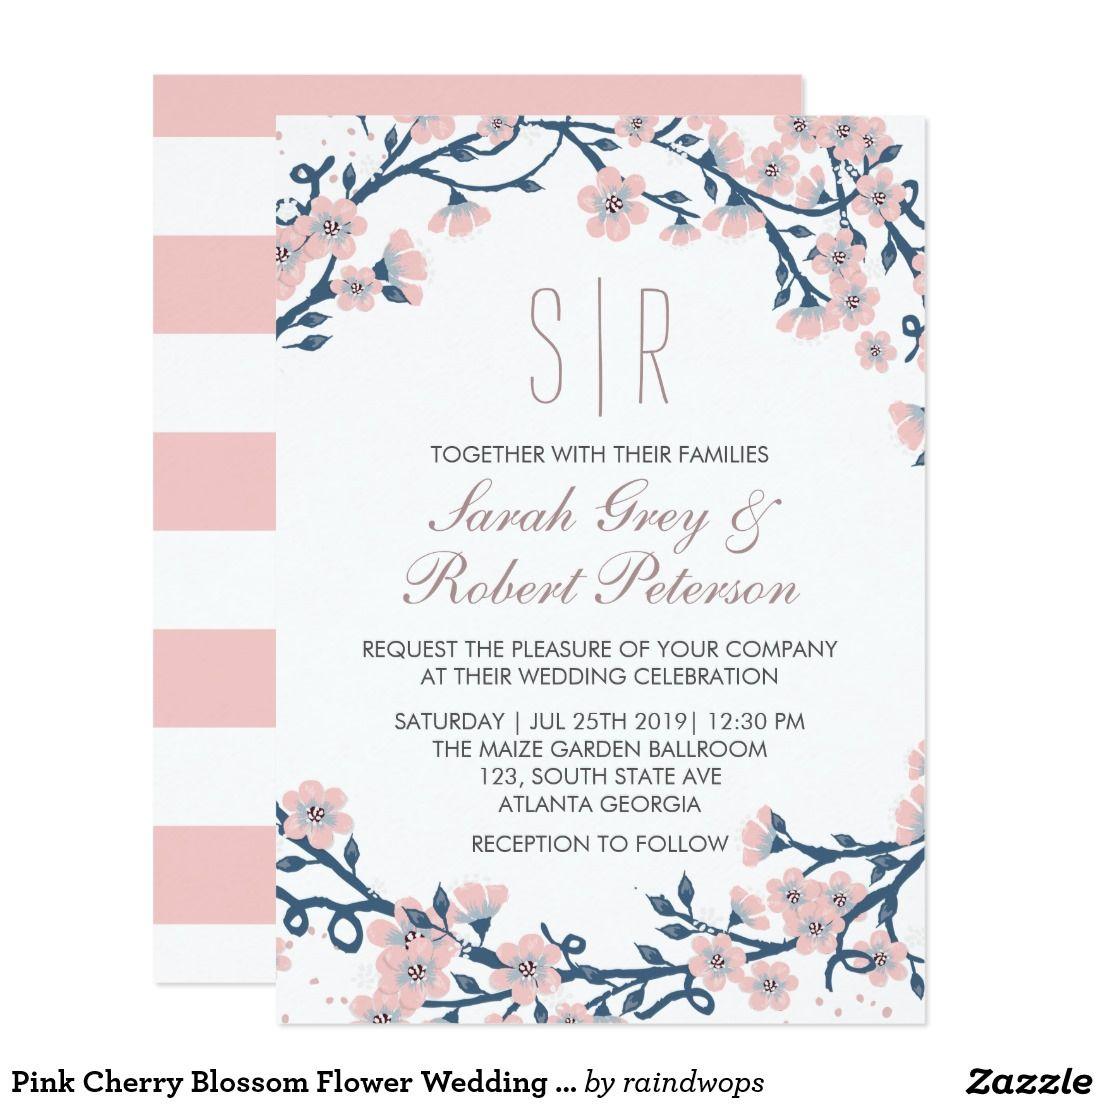 Pink Cherry Blossom Flower Wedding Invitation | invitations ...